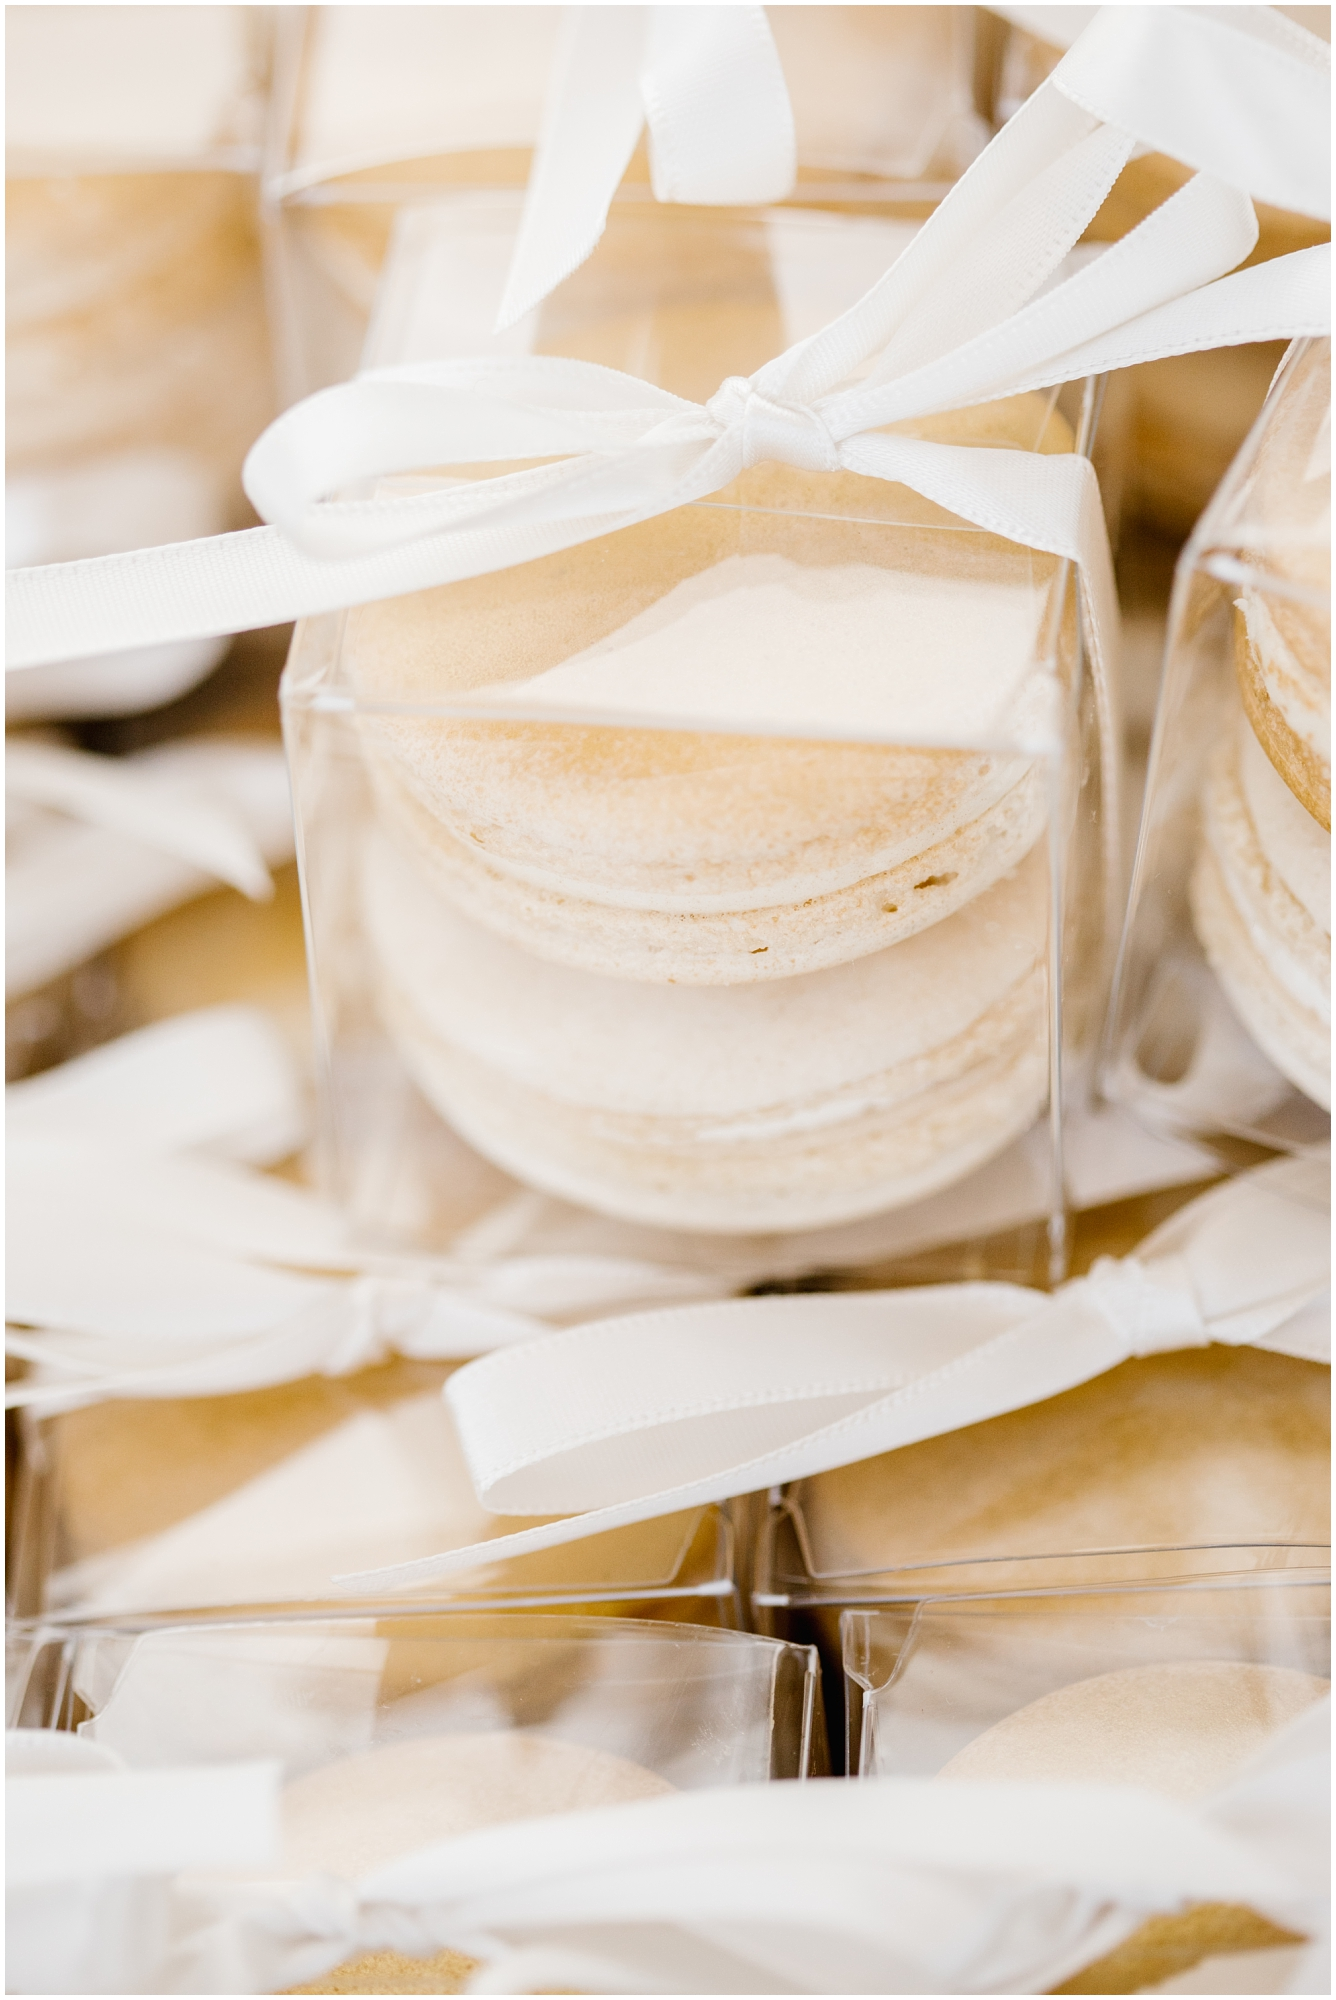 CherylandTyler-469_Lizzie-B-Imagery-Utah-Wedding-Photographer-Park-City-Salt-Lake-City-Temple-Wells-Fargo-Building.jpg